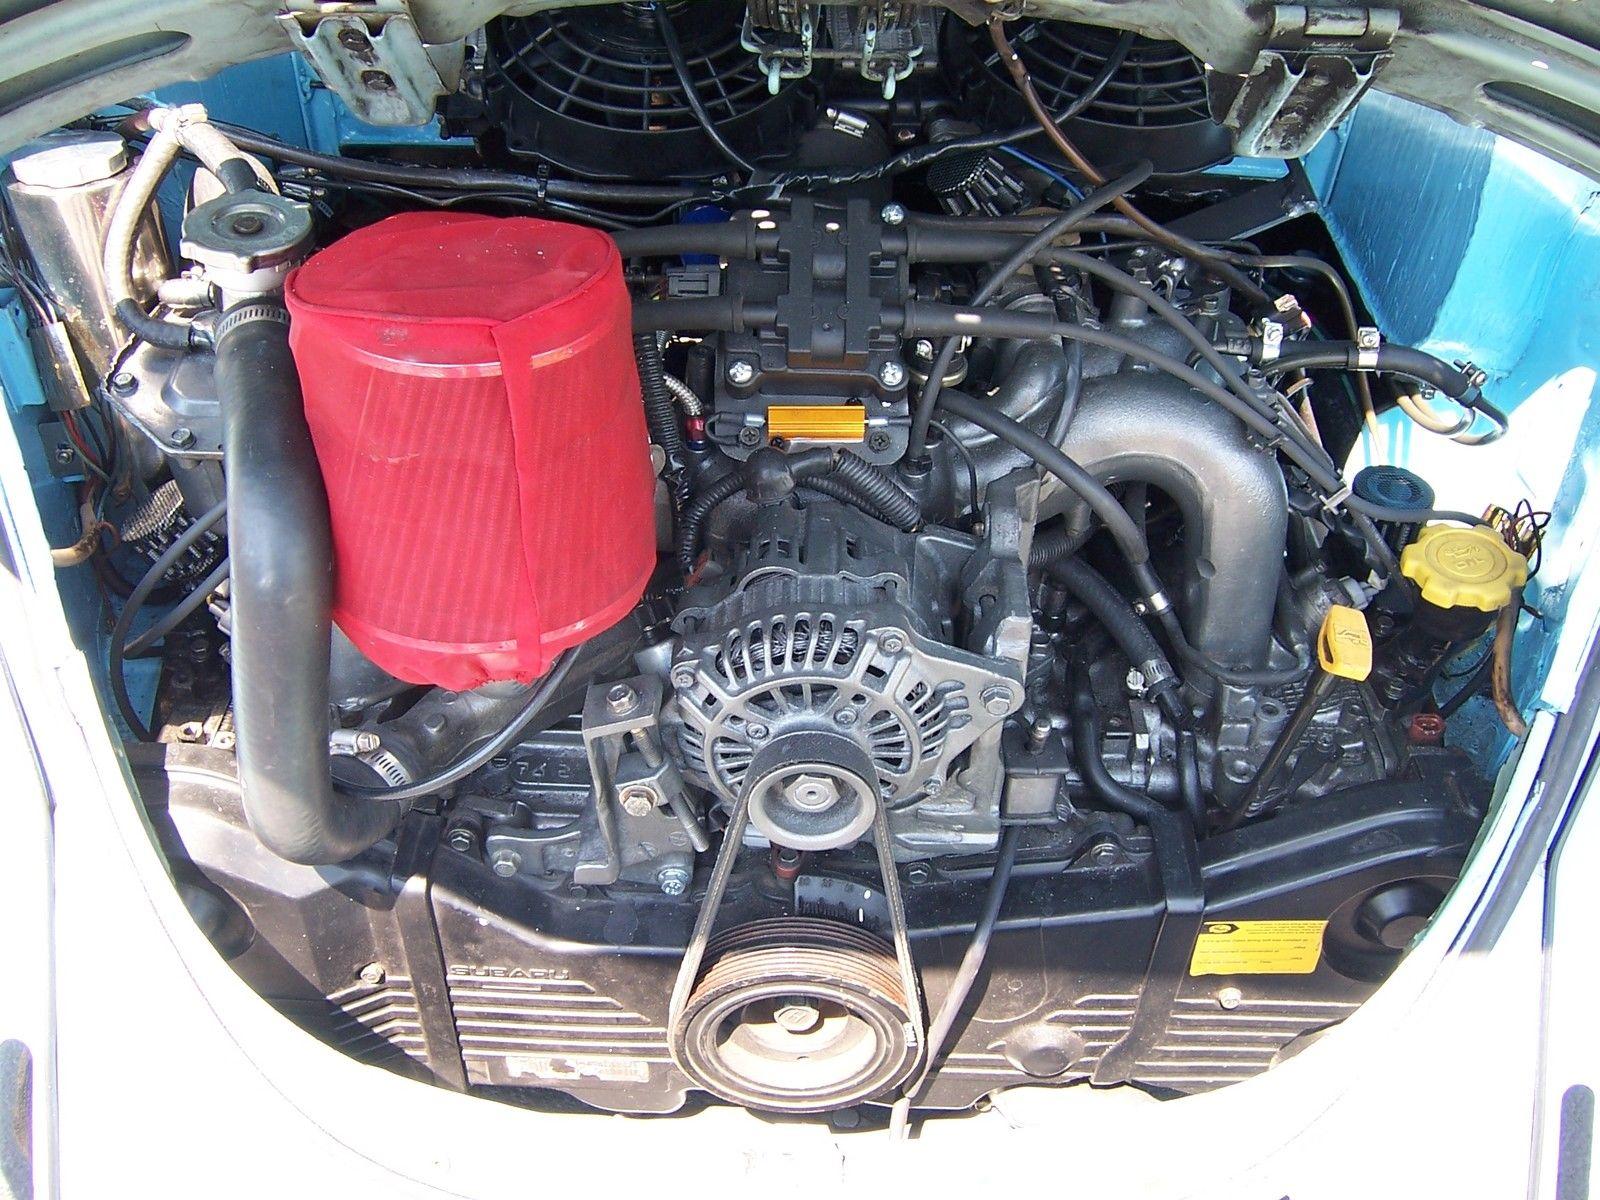 Vw Beetle With A Subaru Ej on Vw Beetle Transmission Swap